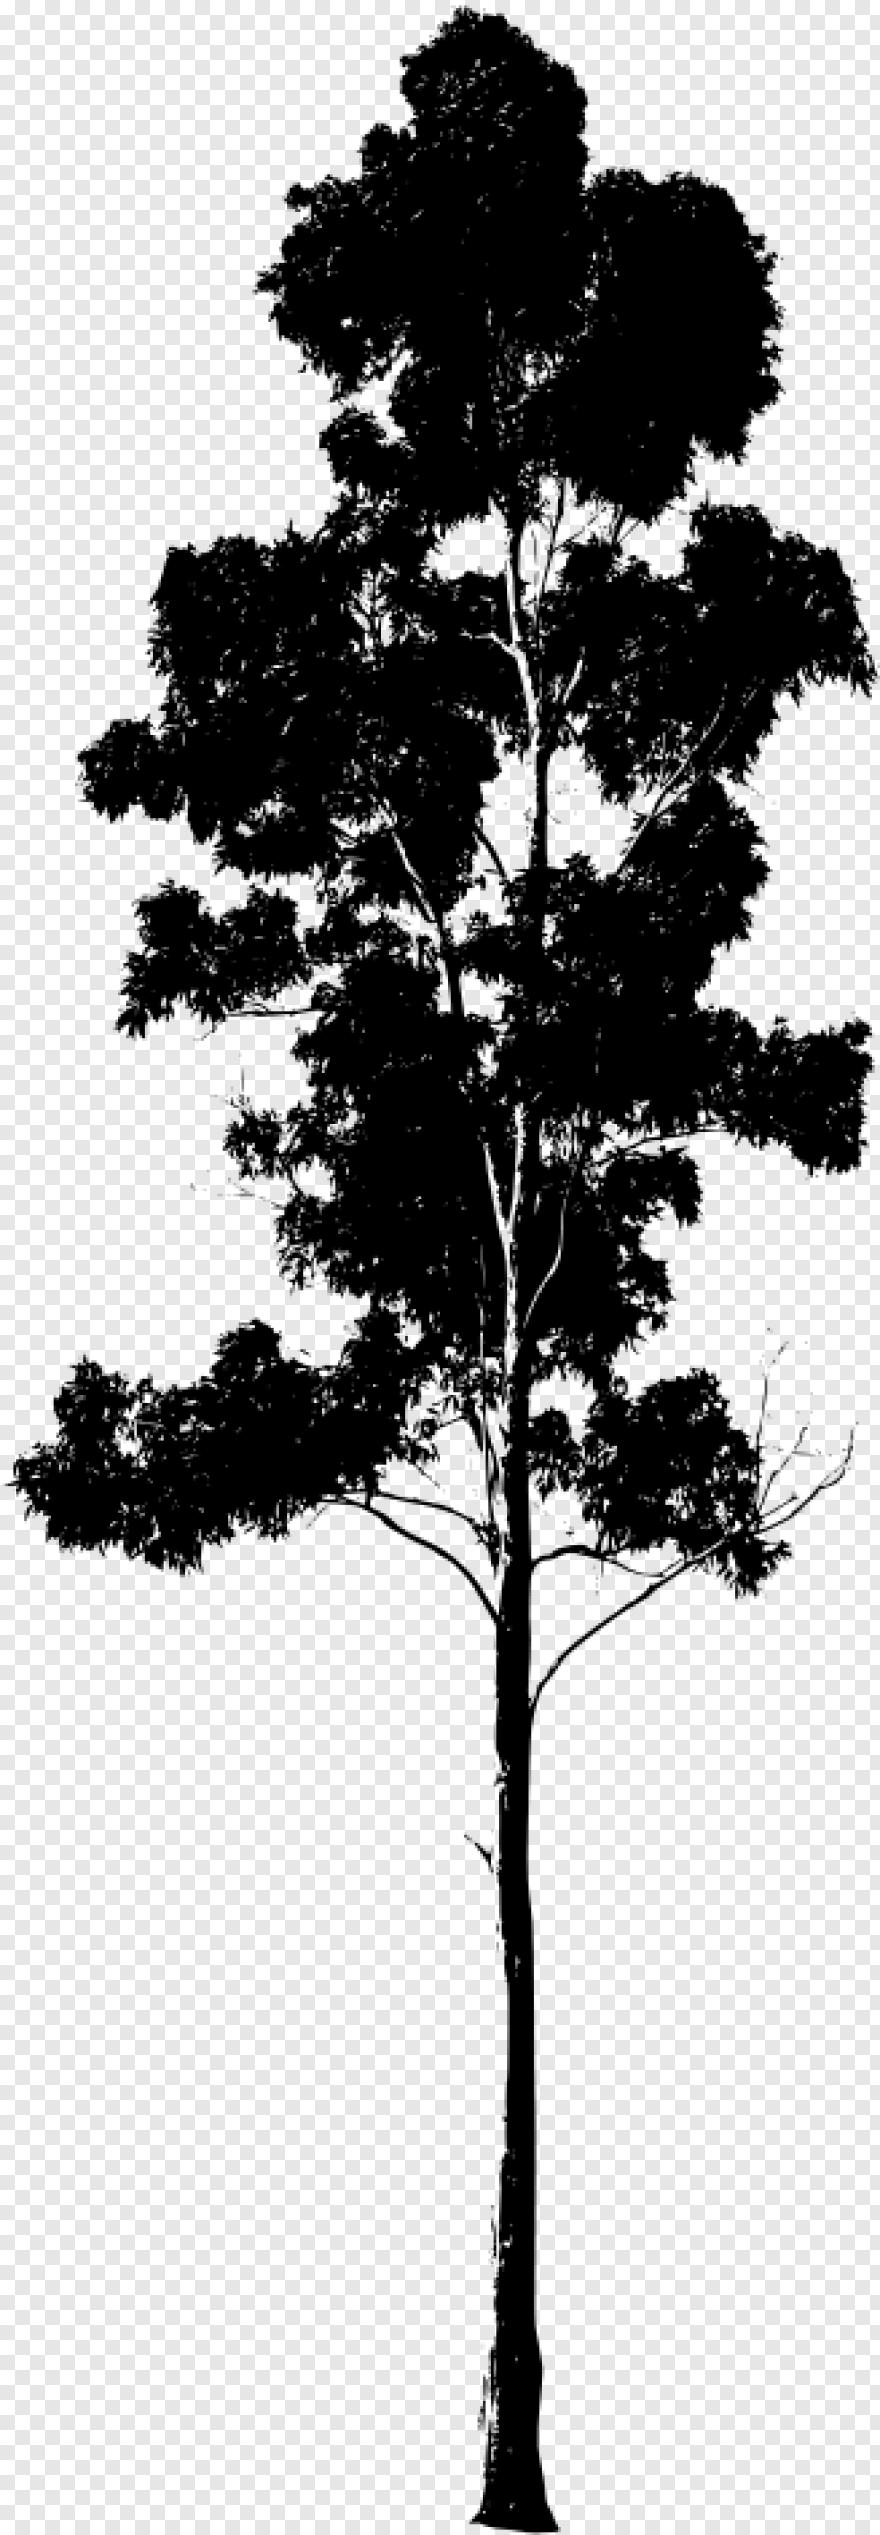 Black Eucalyptus Tree Free Transparent Png